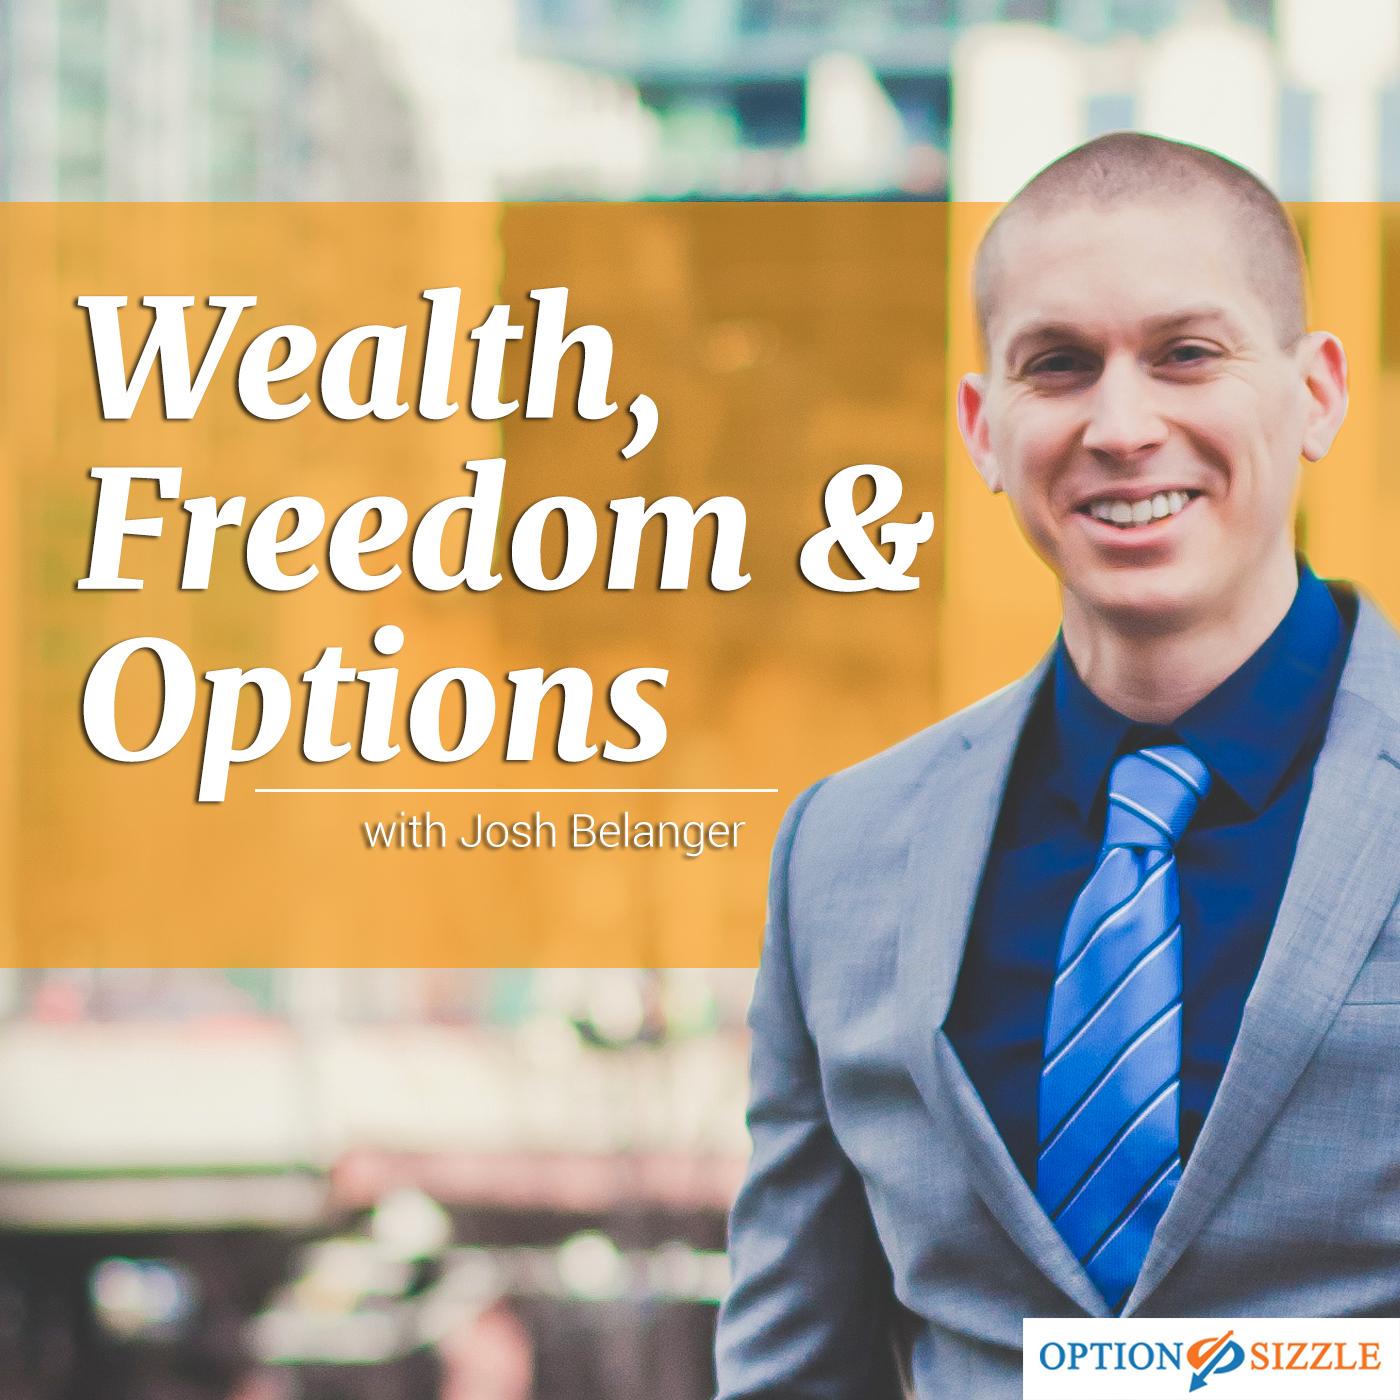 Wealth, Freedom & Options With Joshua Belanger